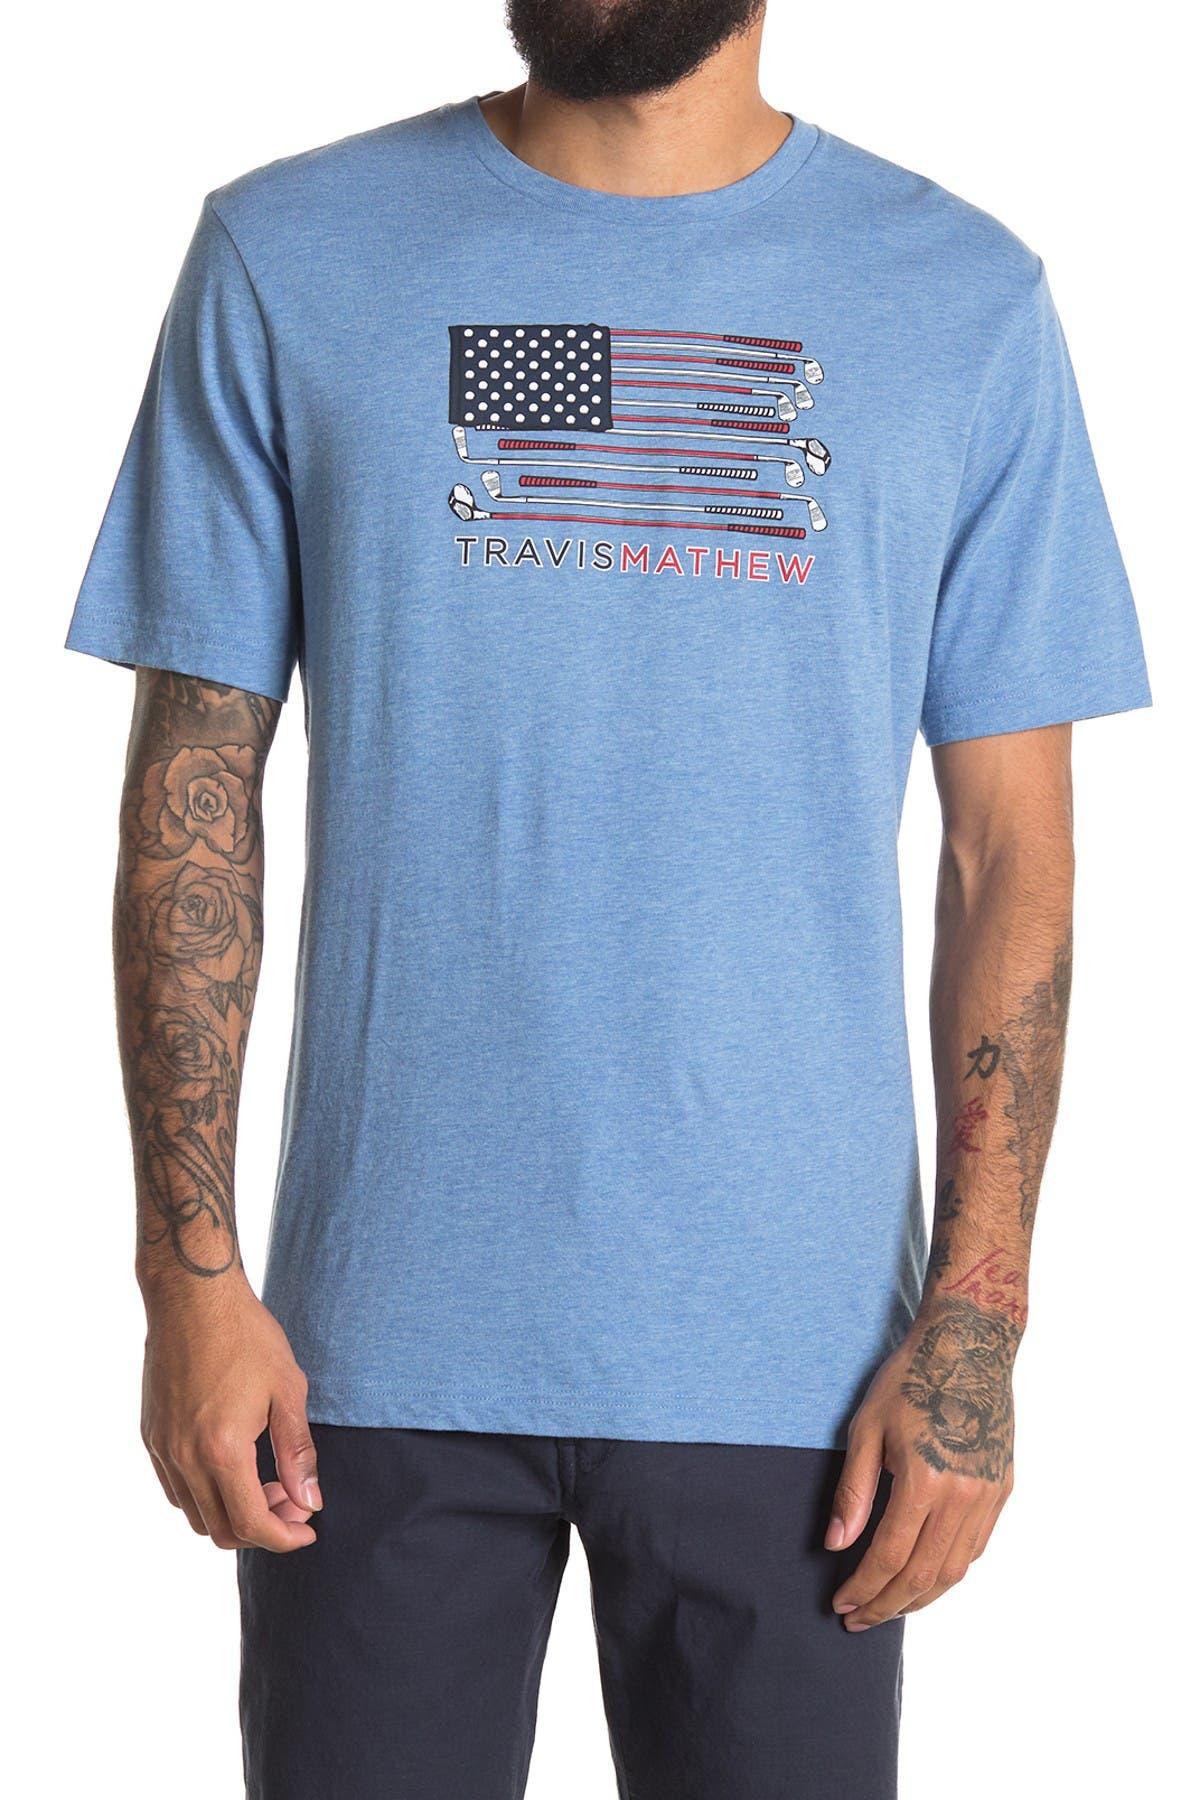 Image of TRAVIS MATHEW Tea Party Short Sleeve Shirt